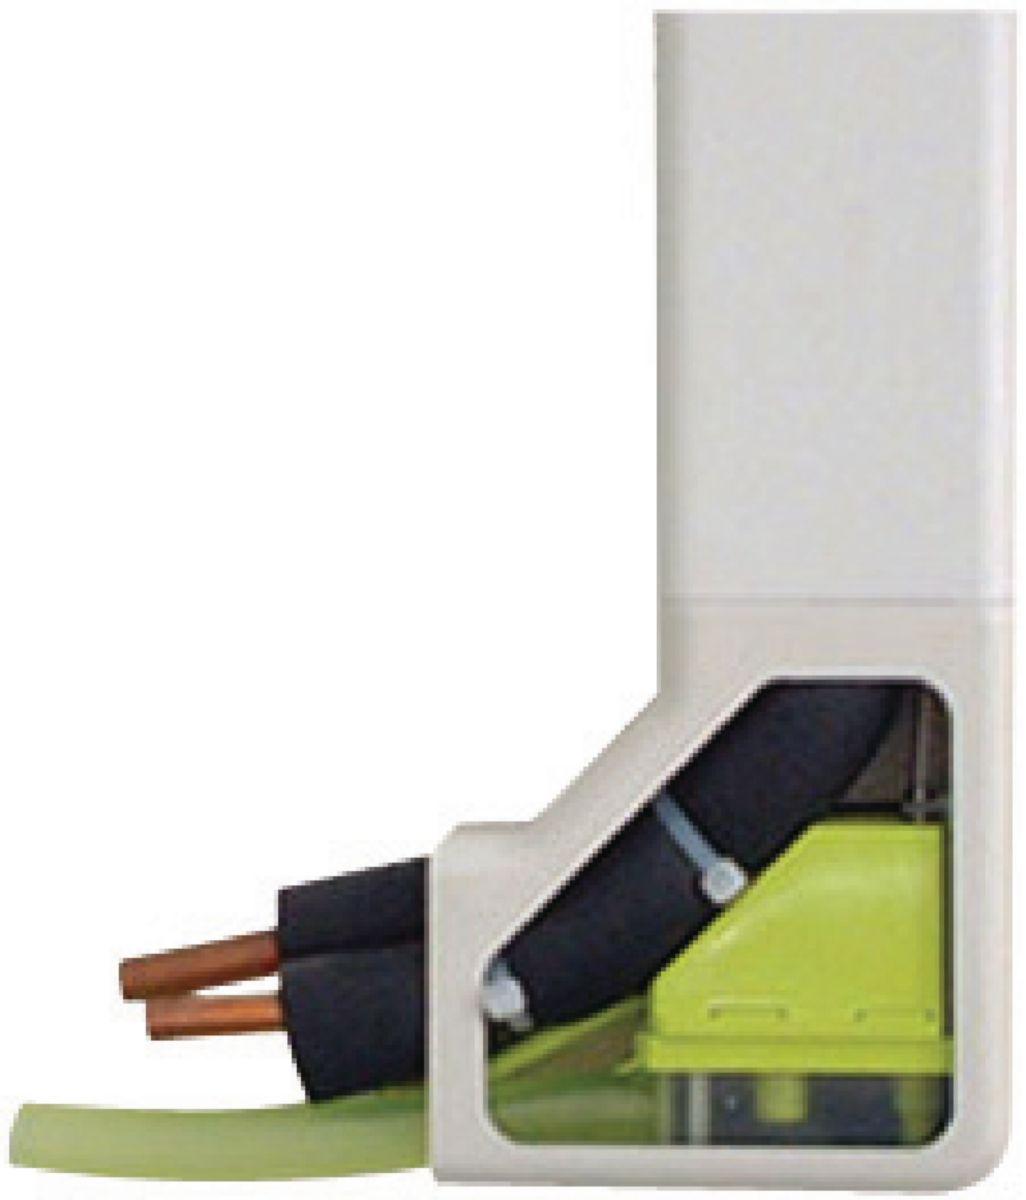 pompe de relevage goulotte miniverte slimline s 12 litres heure r f fp3312 aspen. Black Bedroom Furniture Sets. Home Design Ideas